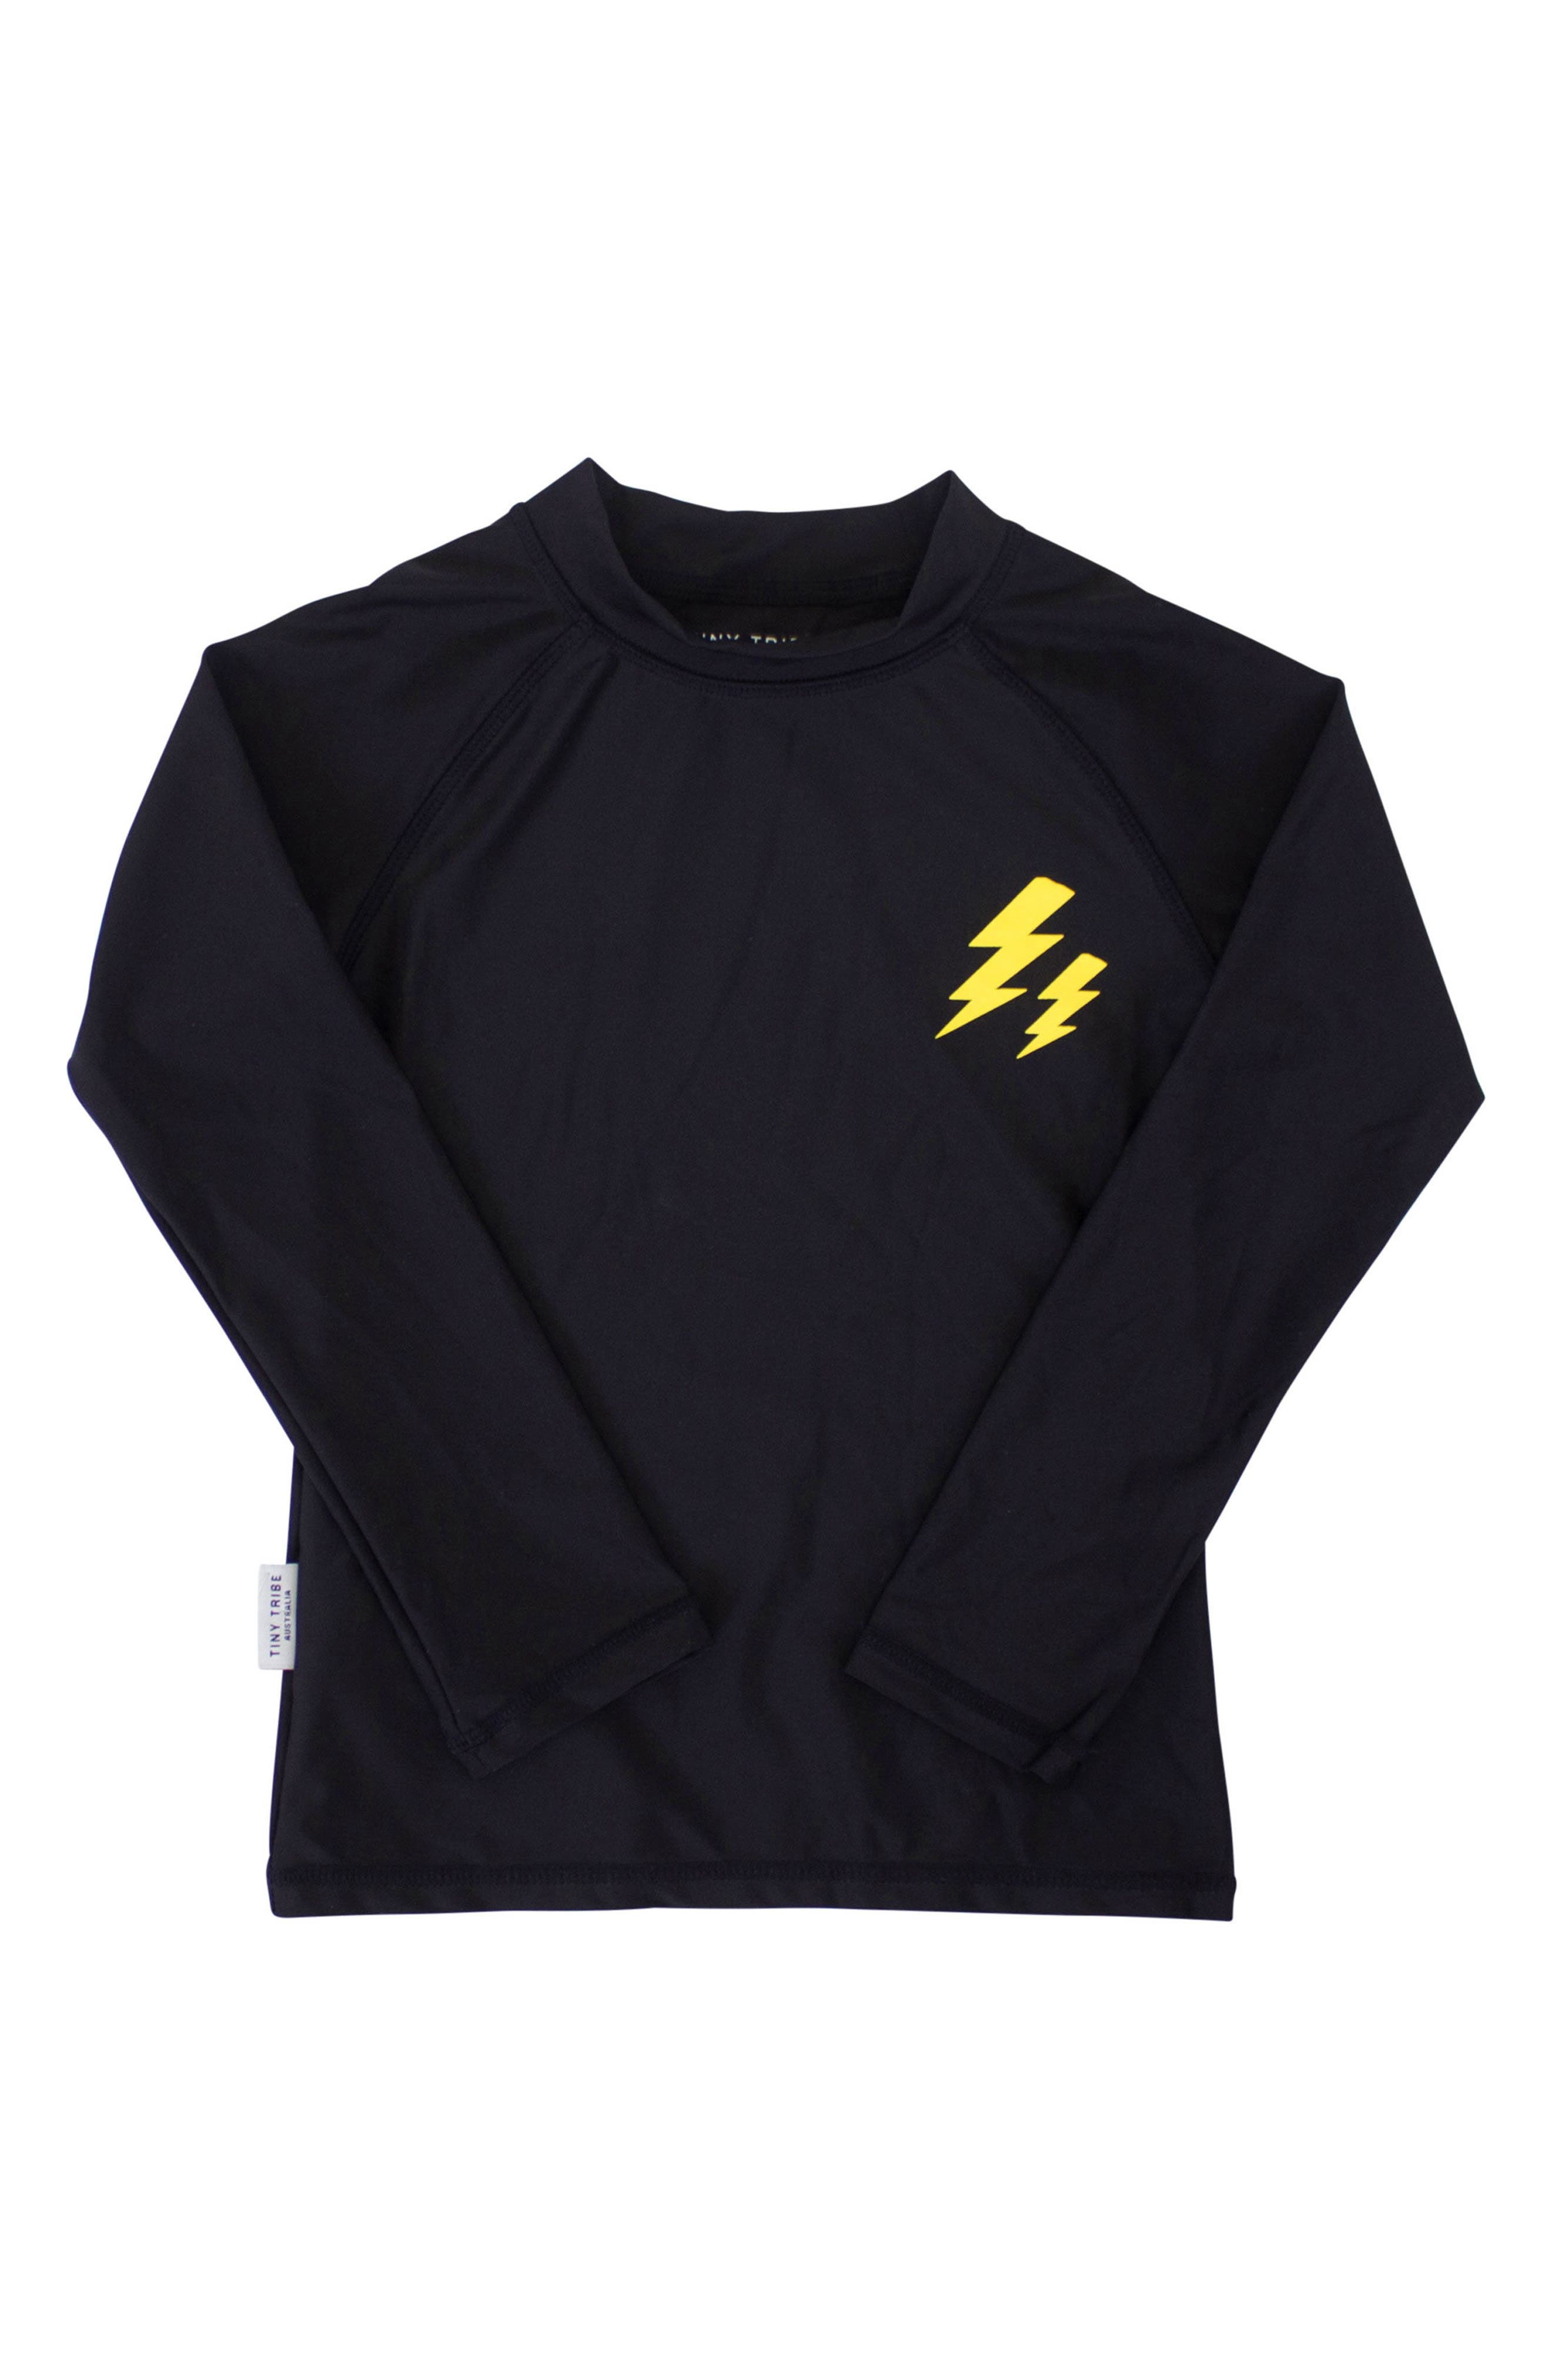 Electric Rashguard Top,                             Main thumbnail 1, color,                             001